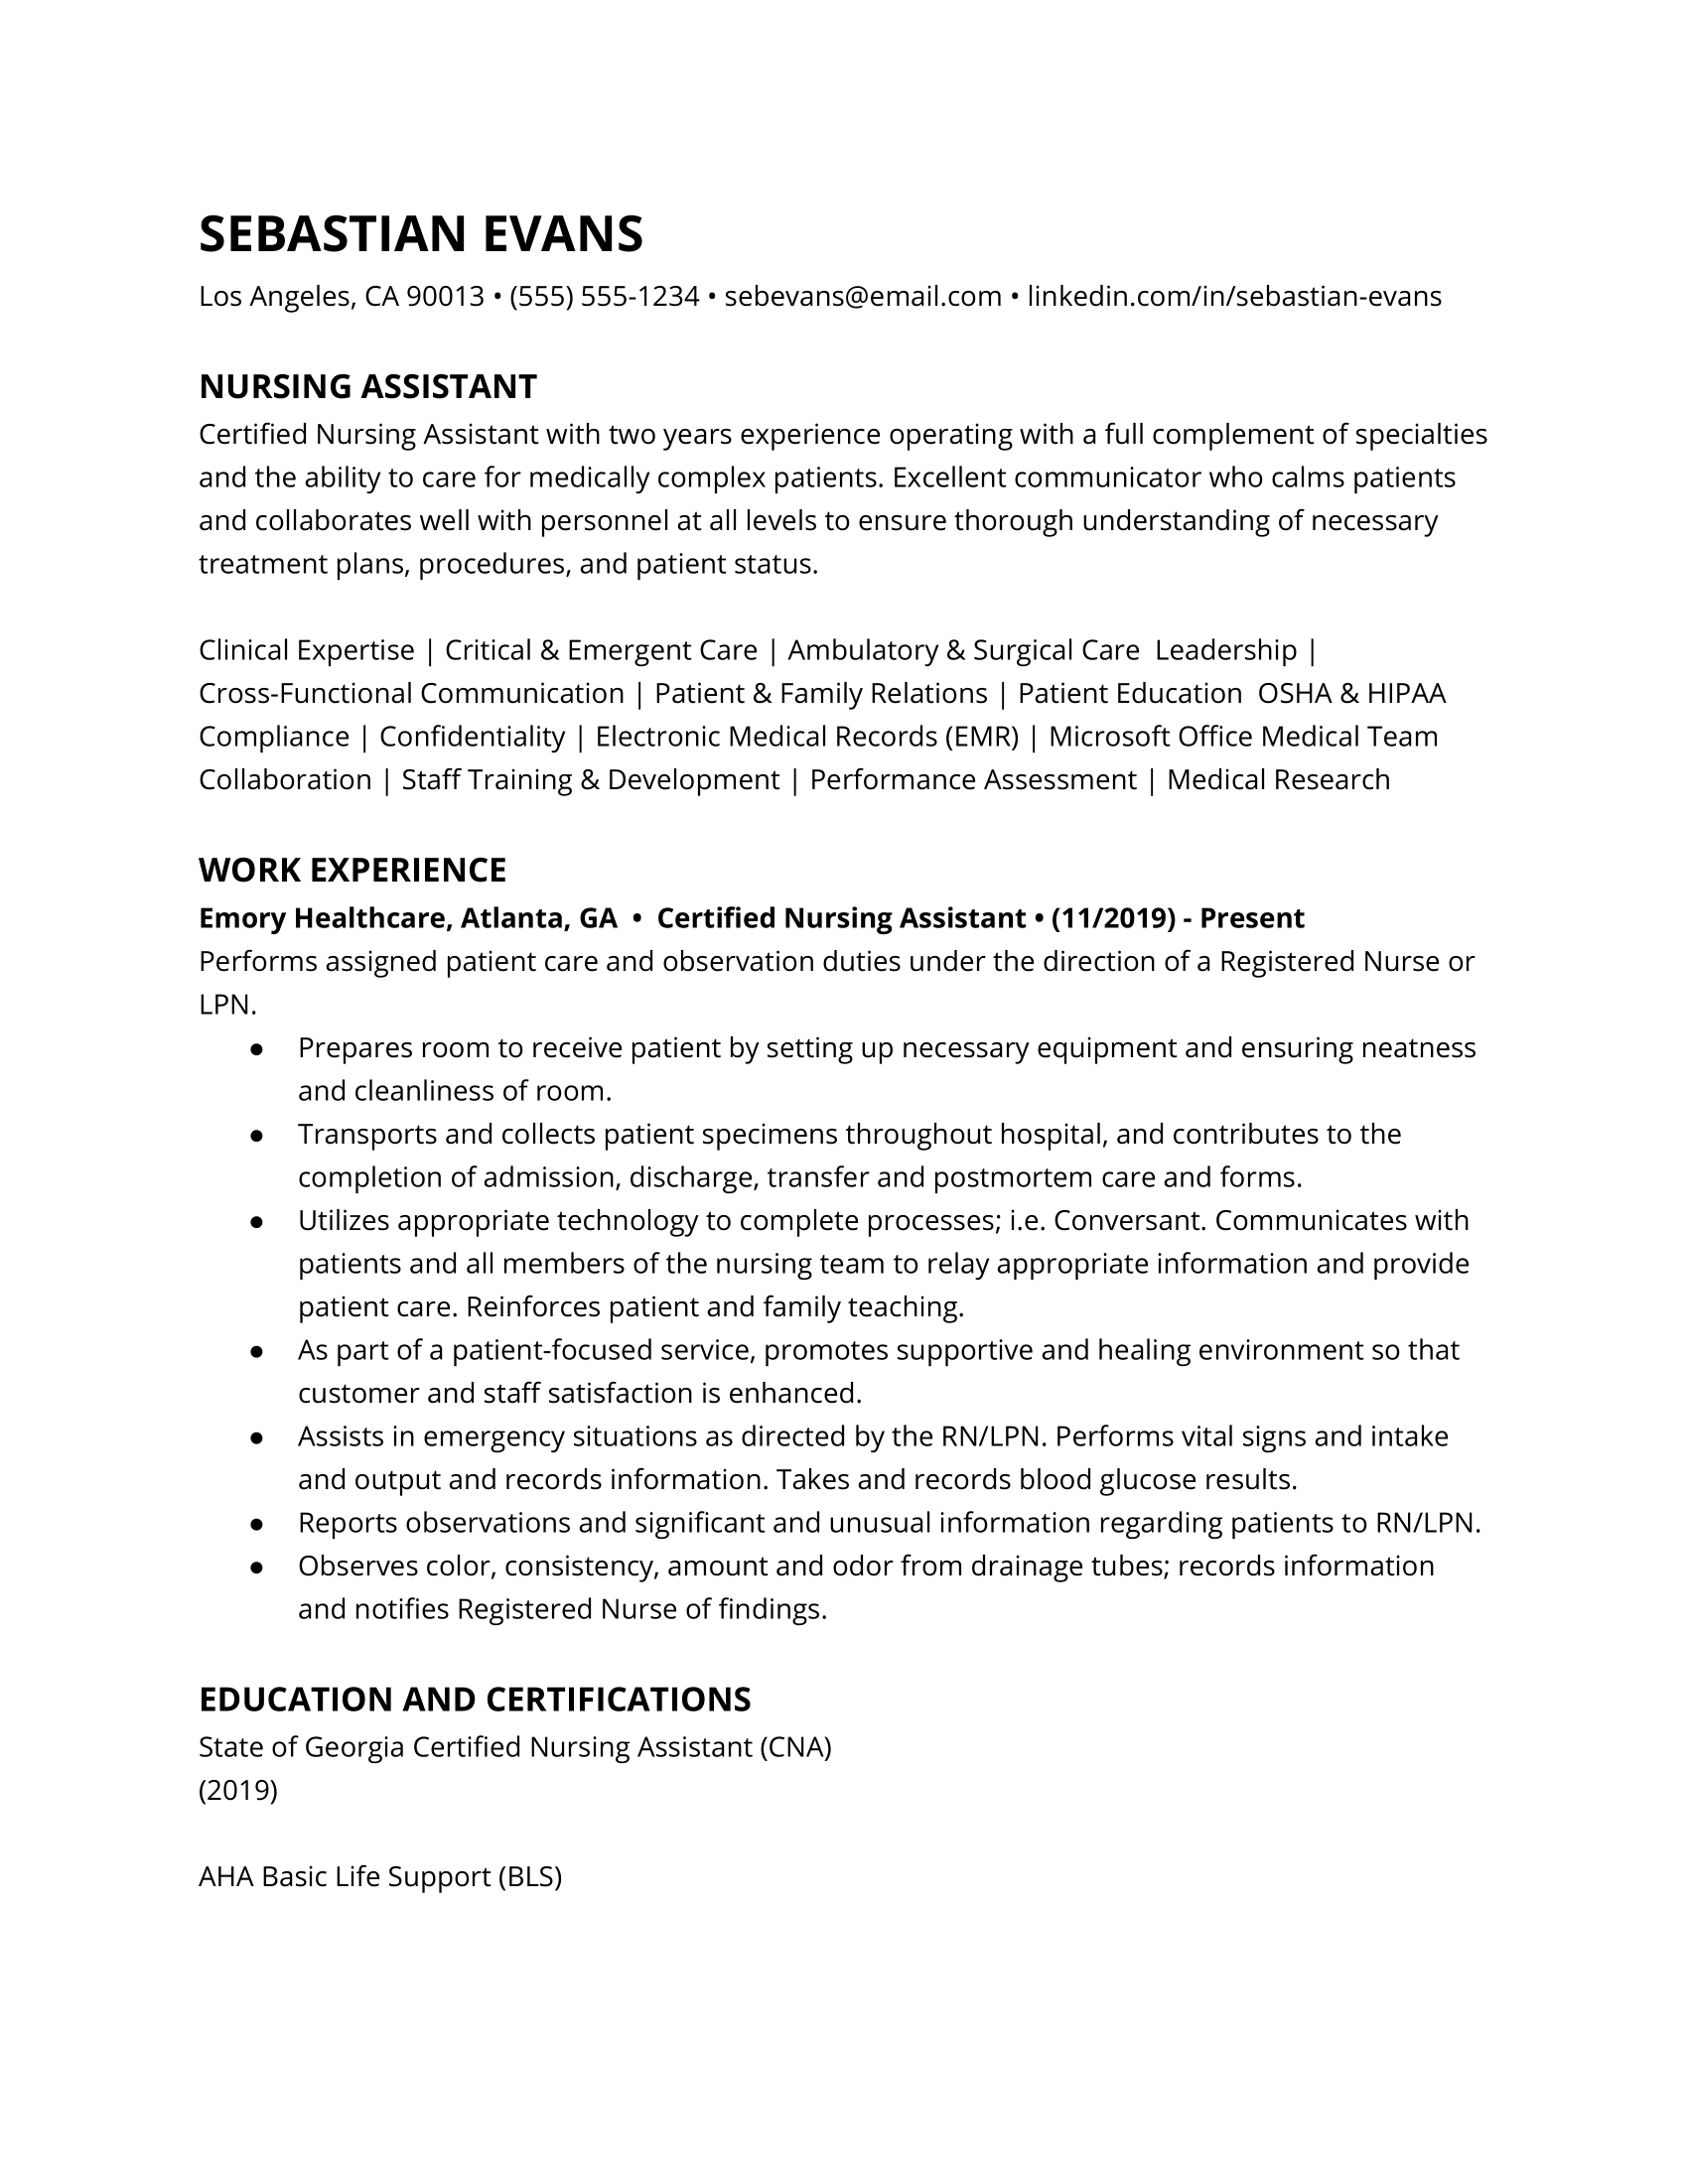 Nursing assistant resume example